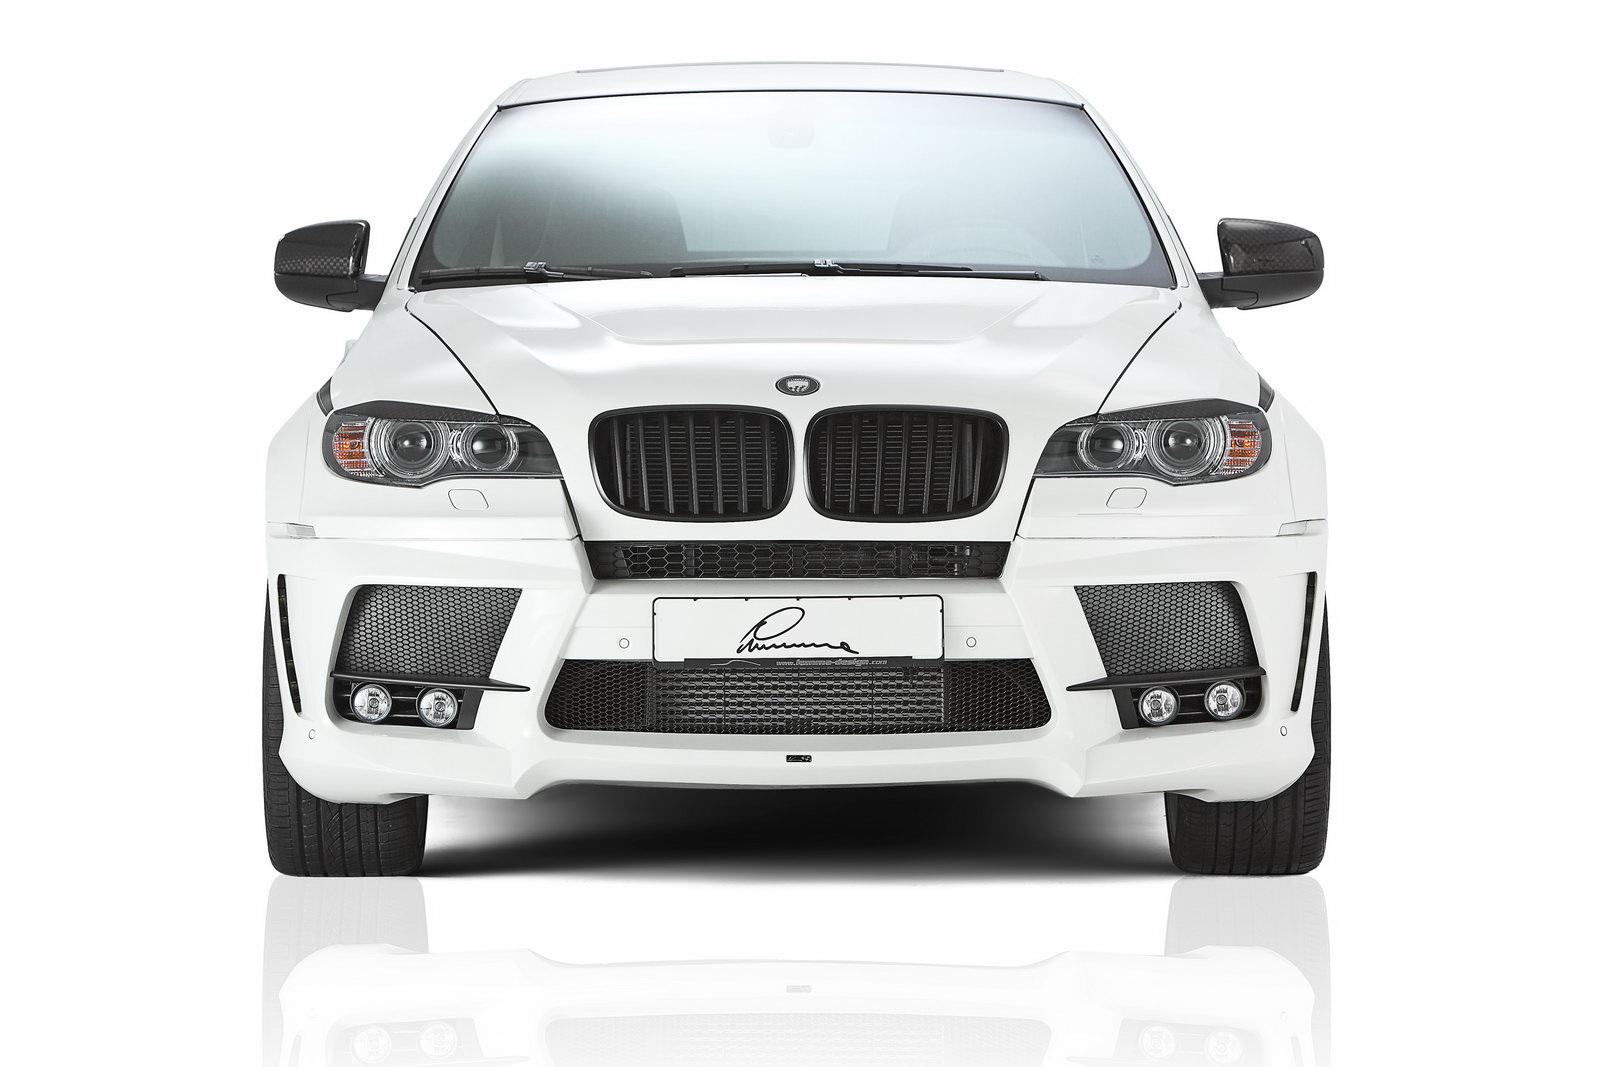 BMW X6 xDrive40d by Lumma Design